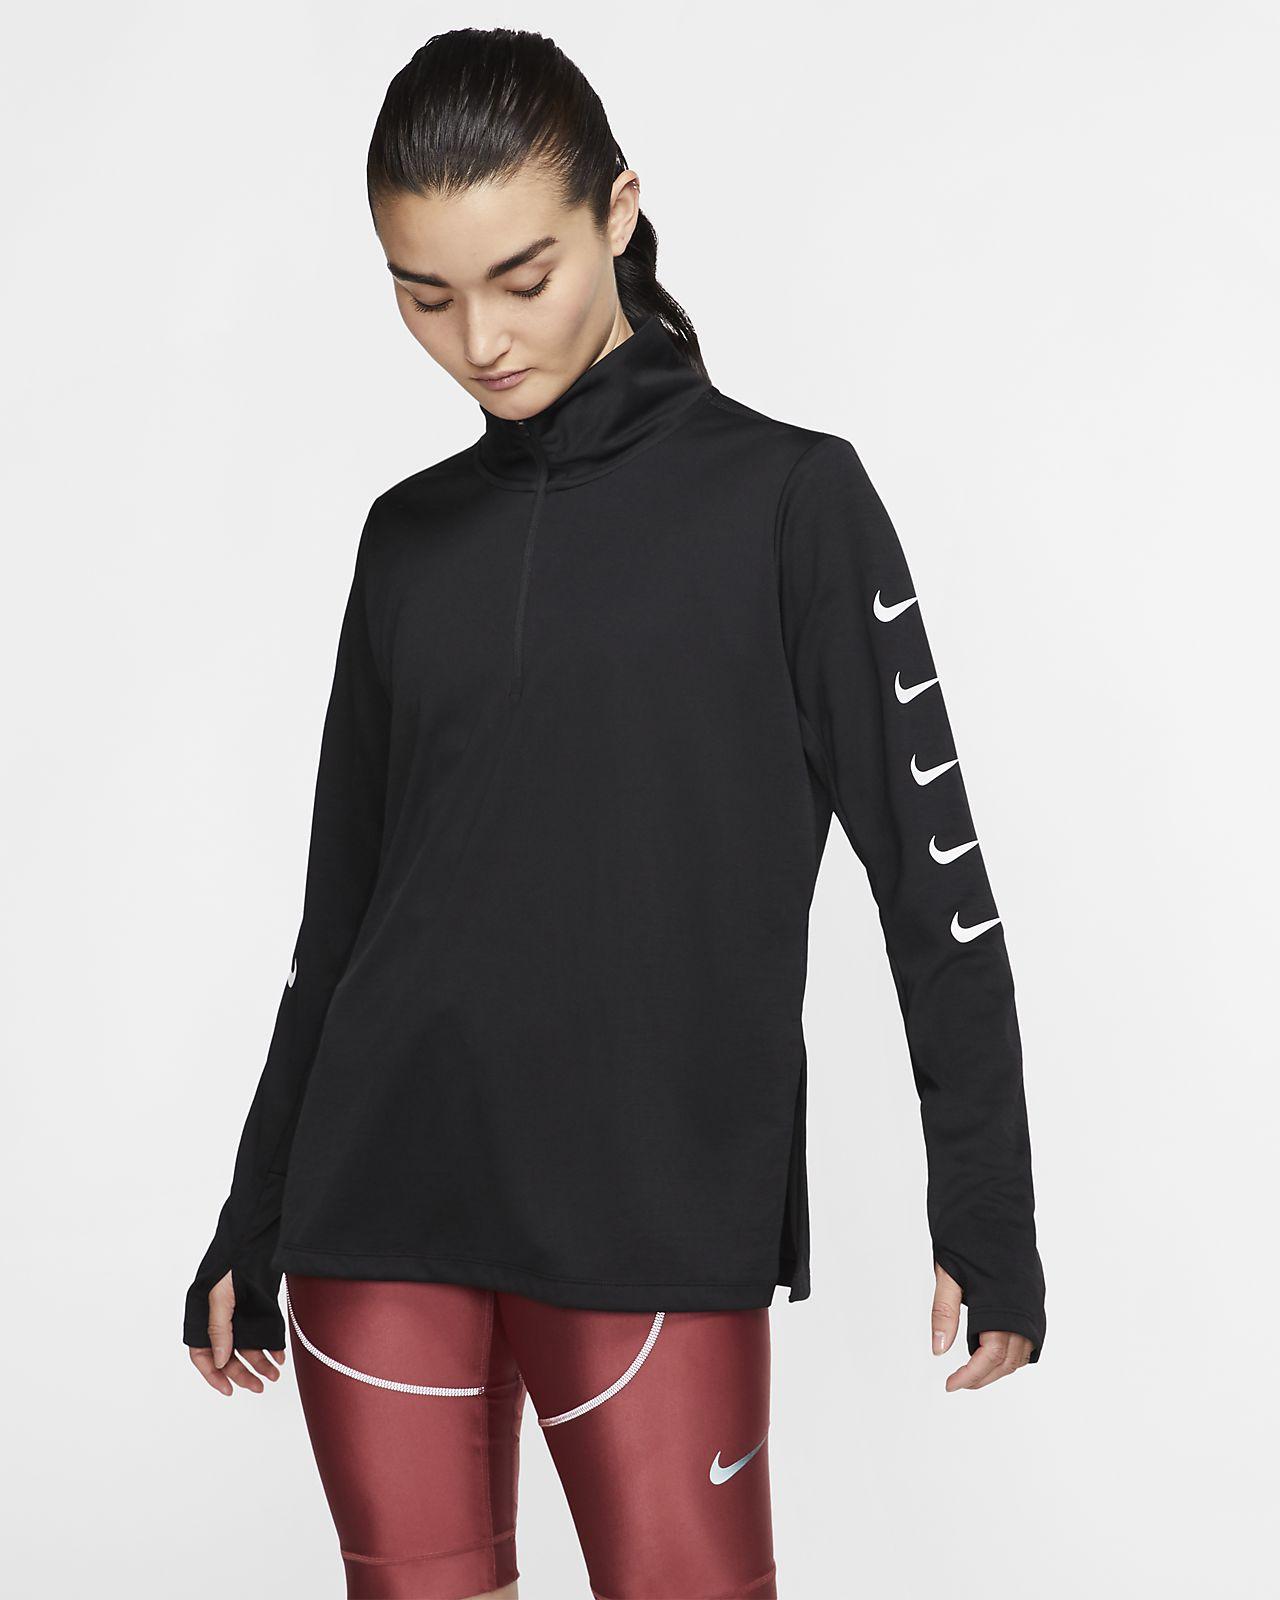 Nike Swoosh Hardlooptop met halflange ritssluiting voor dames